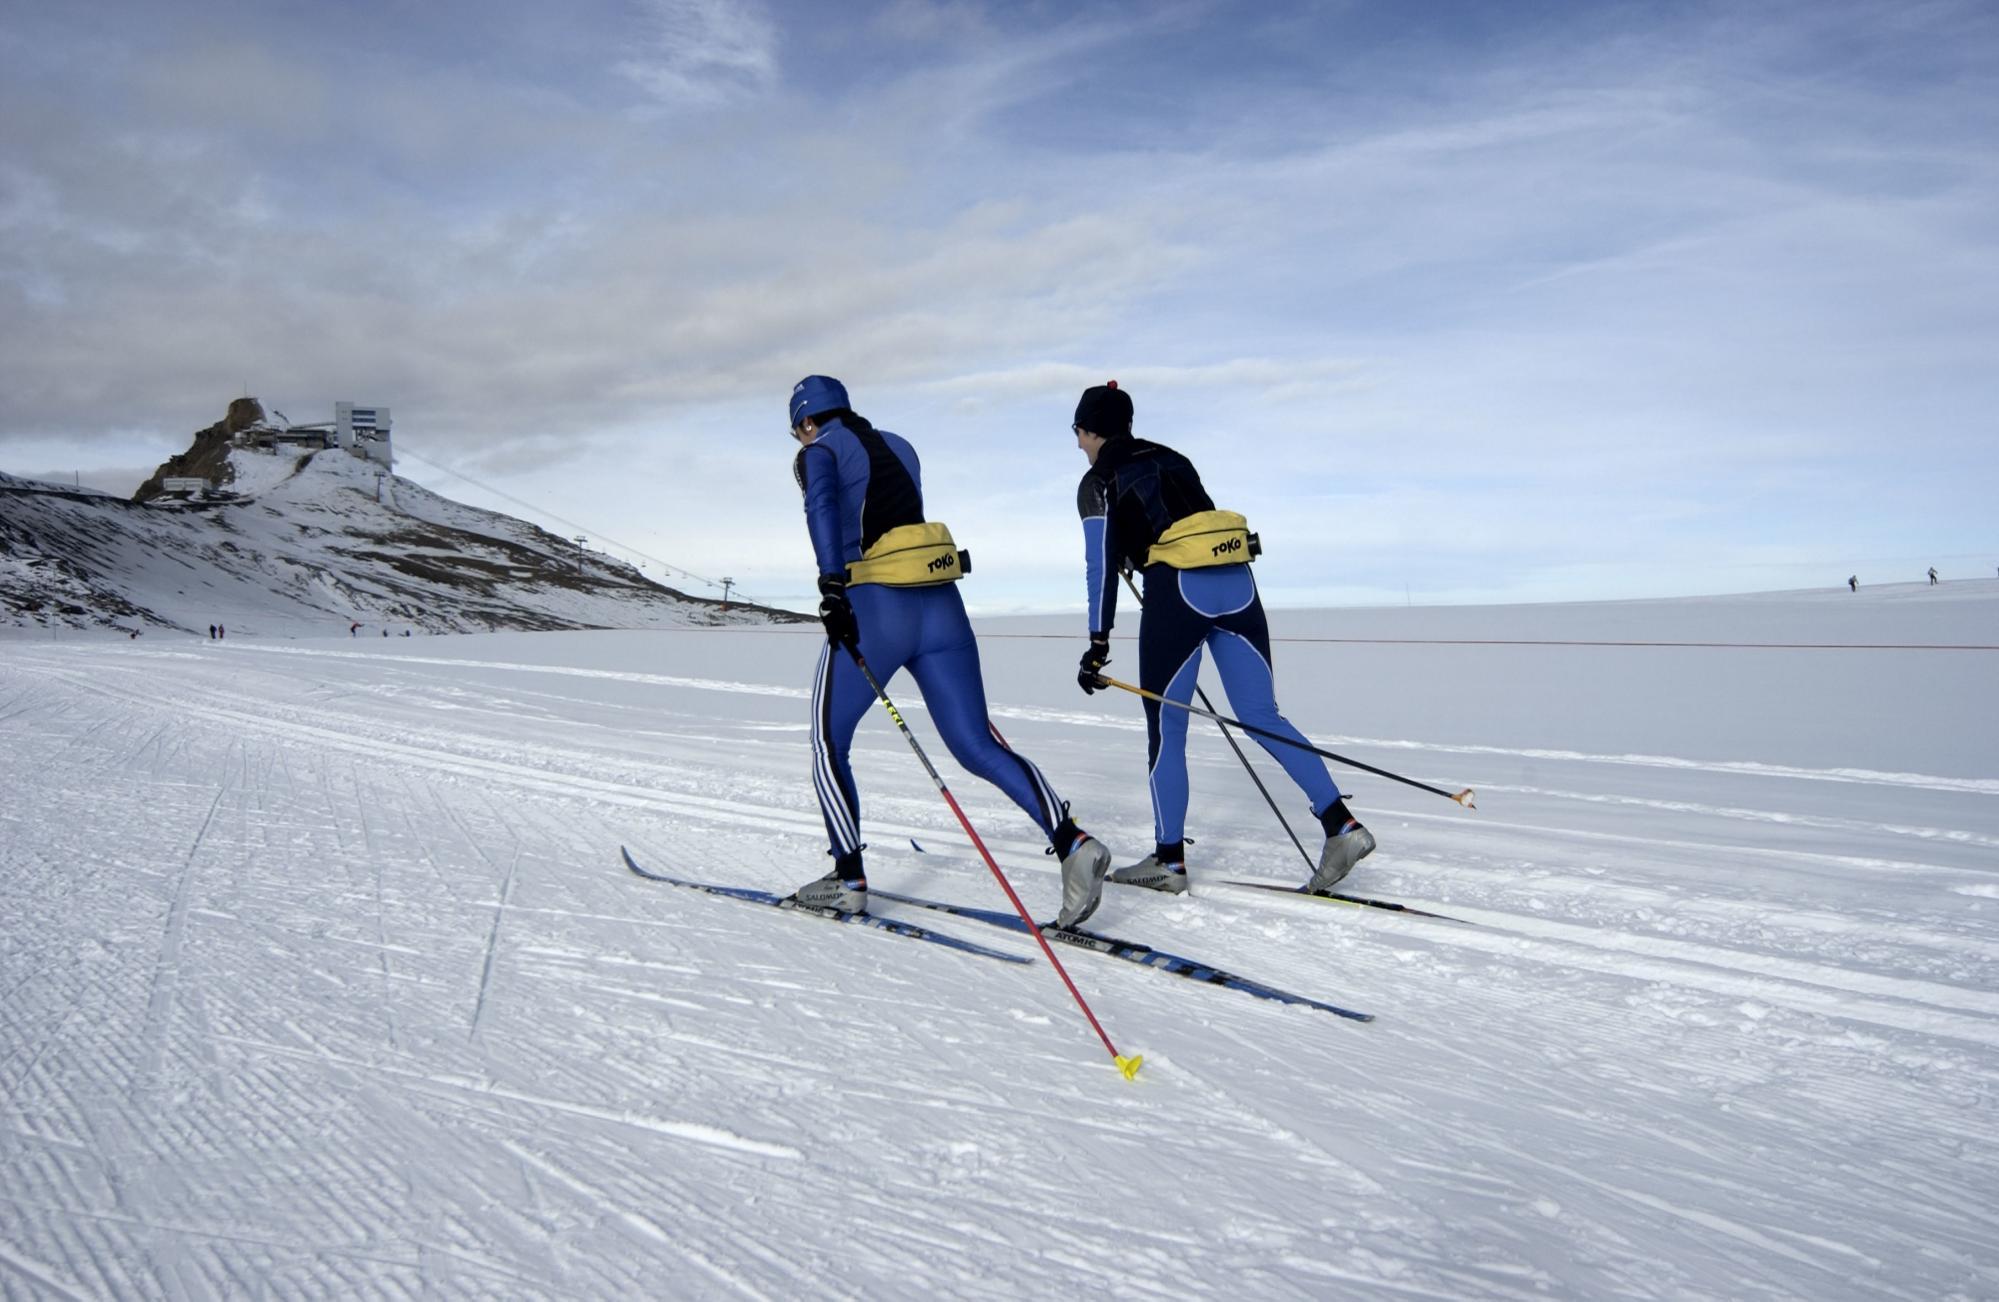 winter sports in montreux riviera montreux riviera